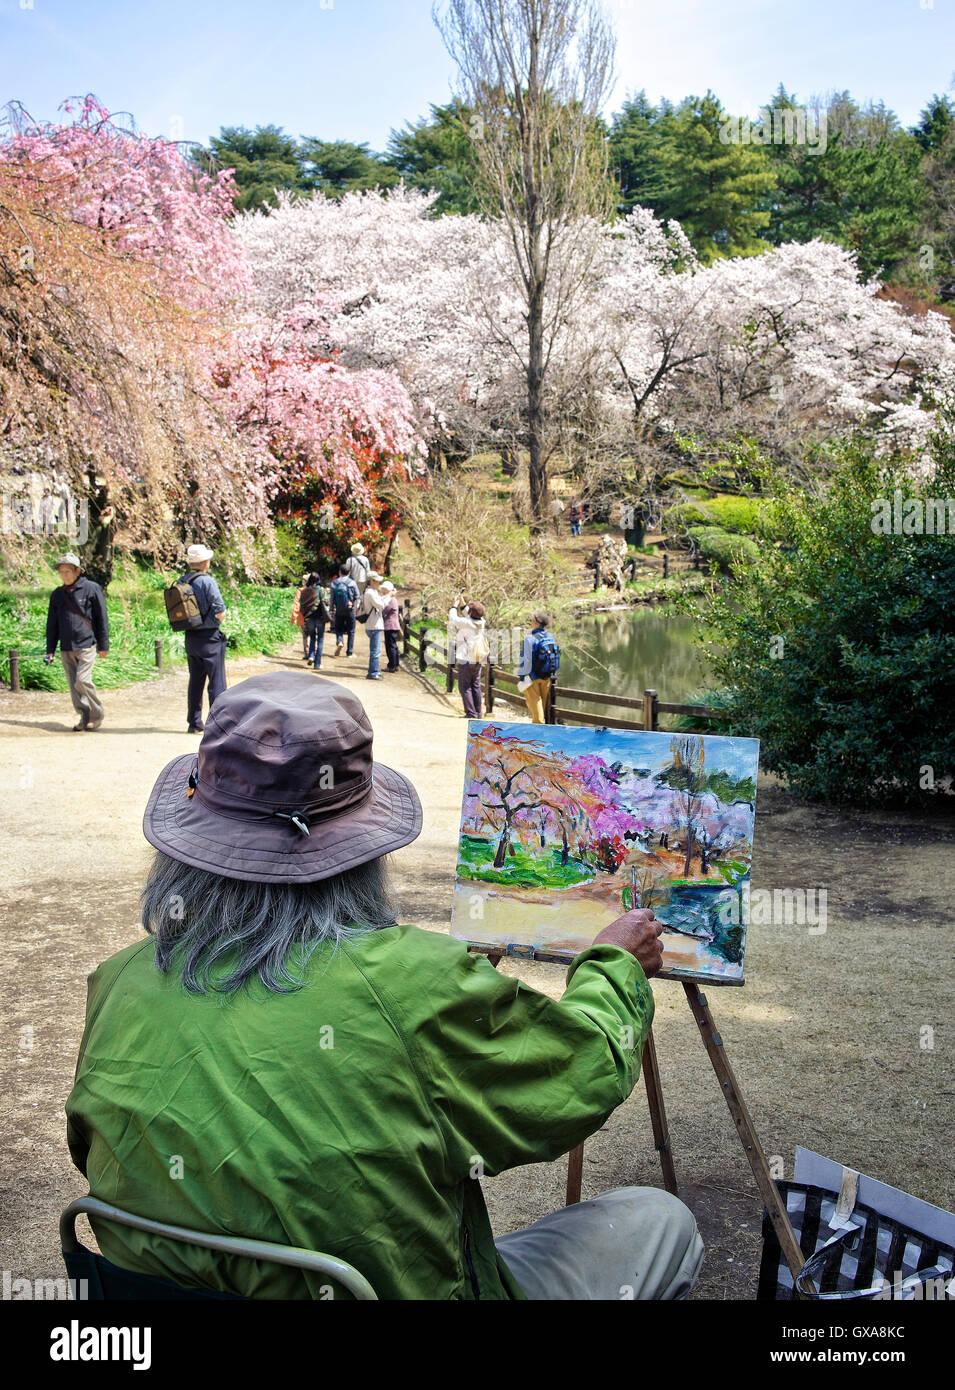 Japan, Honshu island, Kanto, Tokyo, Springtime or Hanami, painting at cherry flowers. - Stock Image